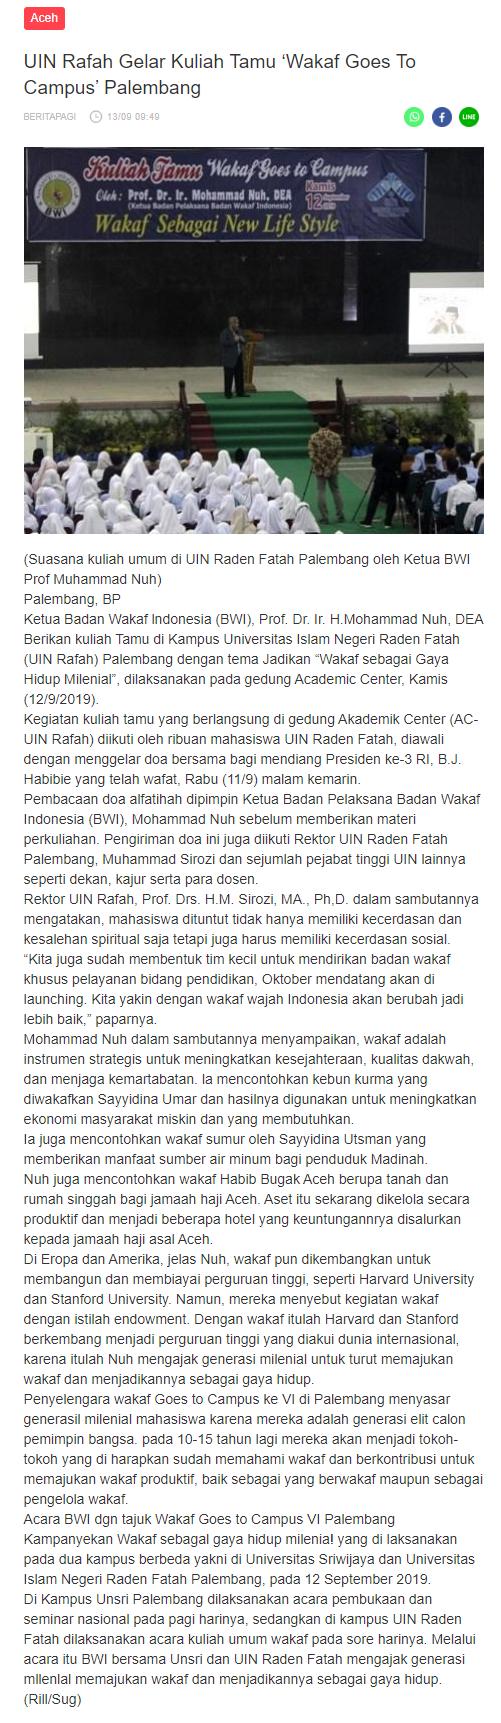 "UIN Rafah Gelar Kuliah Tamu ""Wakaf Goes To Campus"" Palembang  - screenshot berita - UIN Rafah Gelar Kuliah Tamu ""Wakaf Goes To Campus"" Palembang"